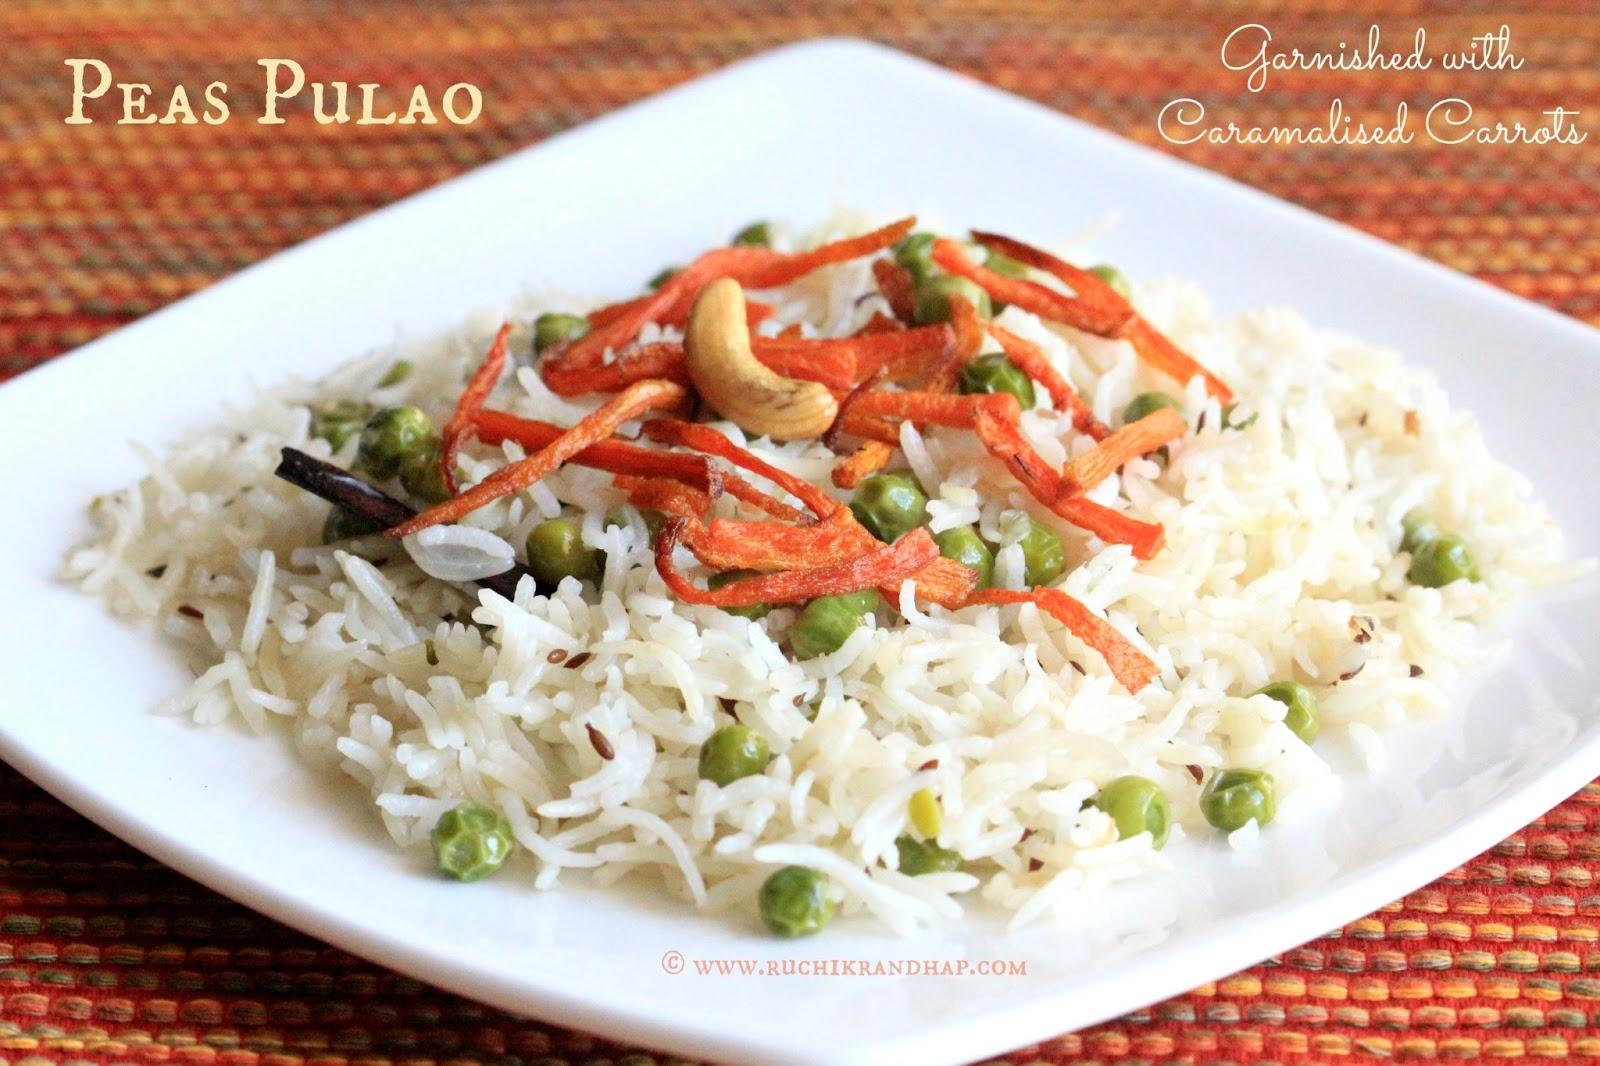 ... Peas Pulao & a Product Review of Star Saver Tibar Basmati Rice & ...